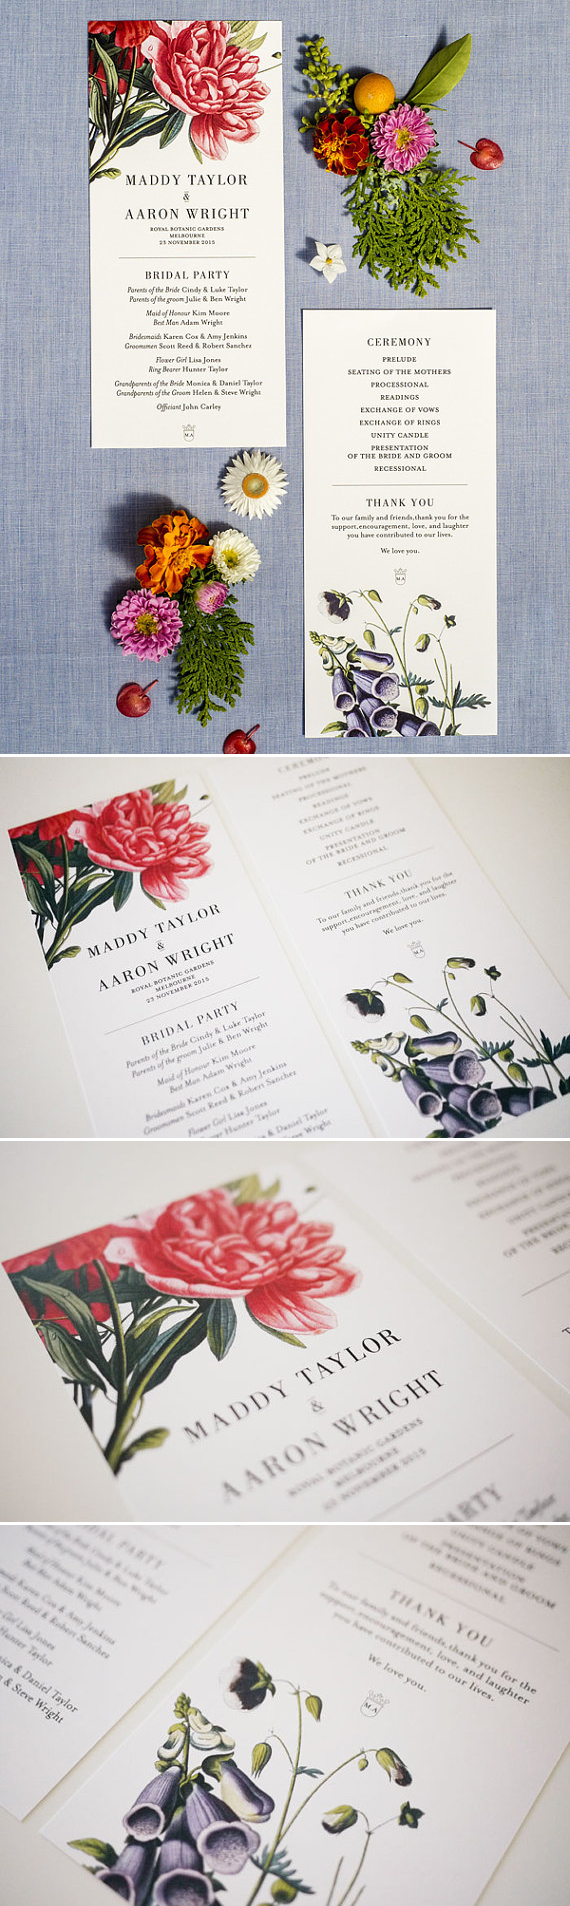 Botanical Floral Order of Service Wedding Program Printable   3EggsDesign #design #graphicdesign #wedding